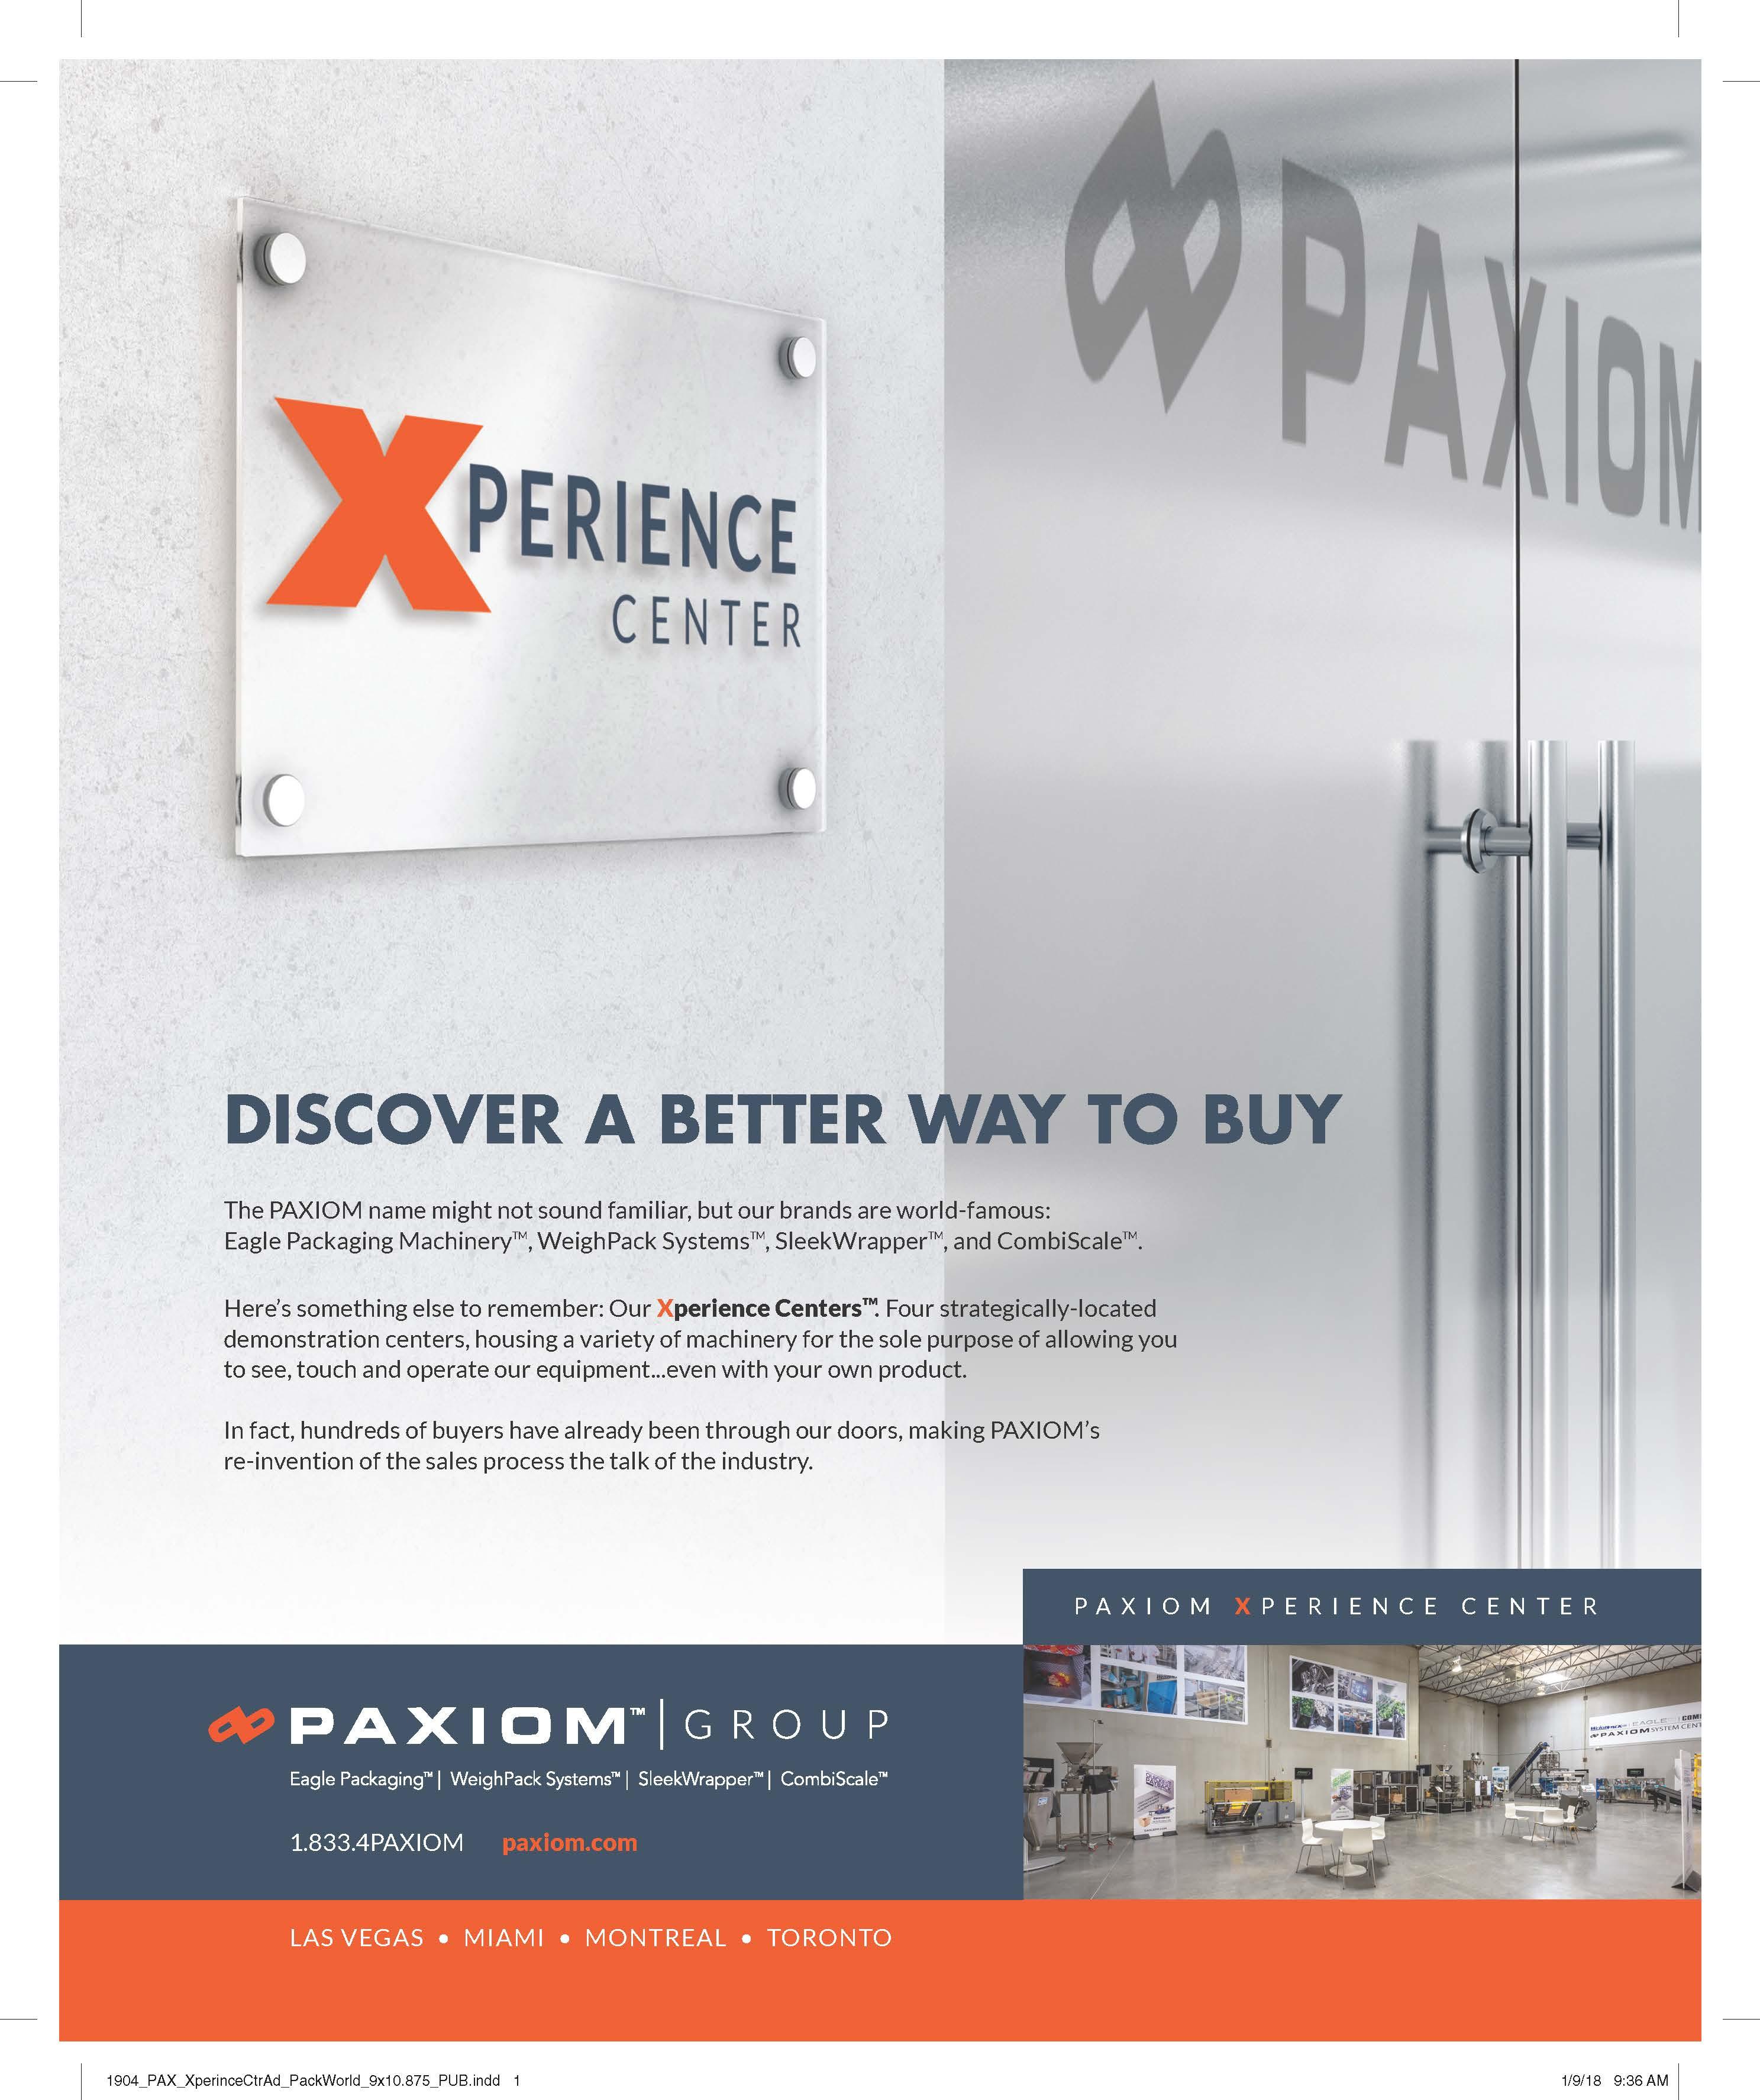 Paxiom Xperience Center